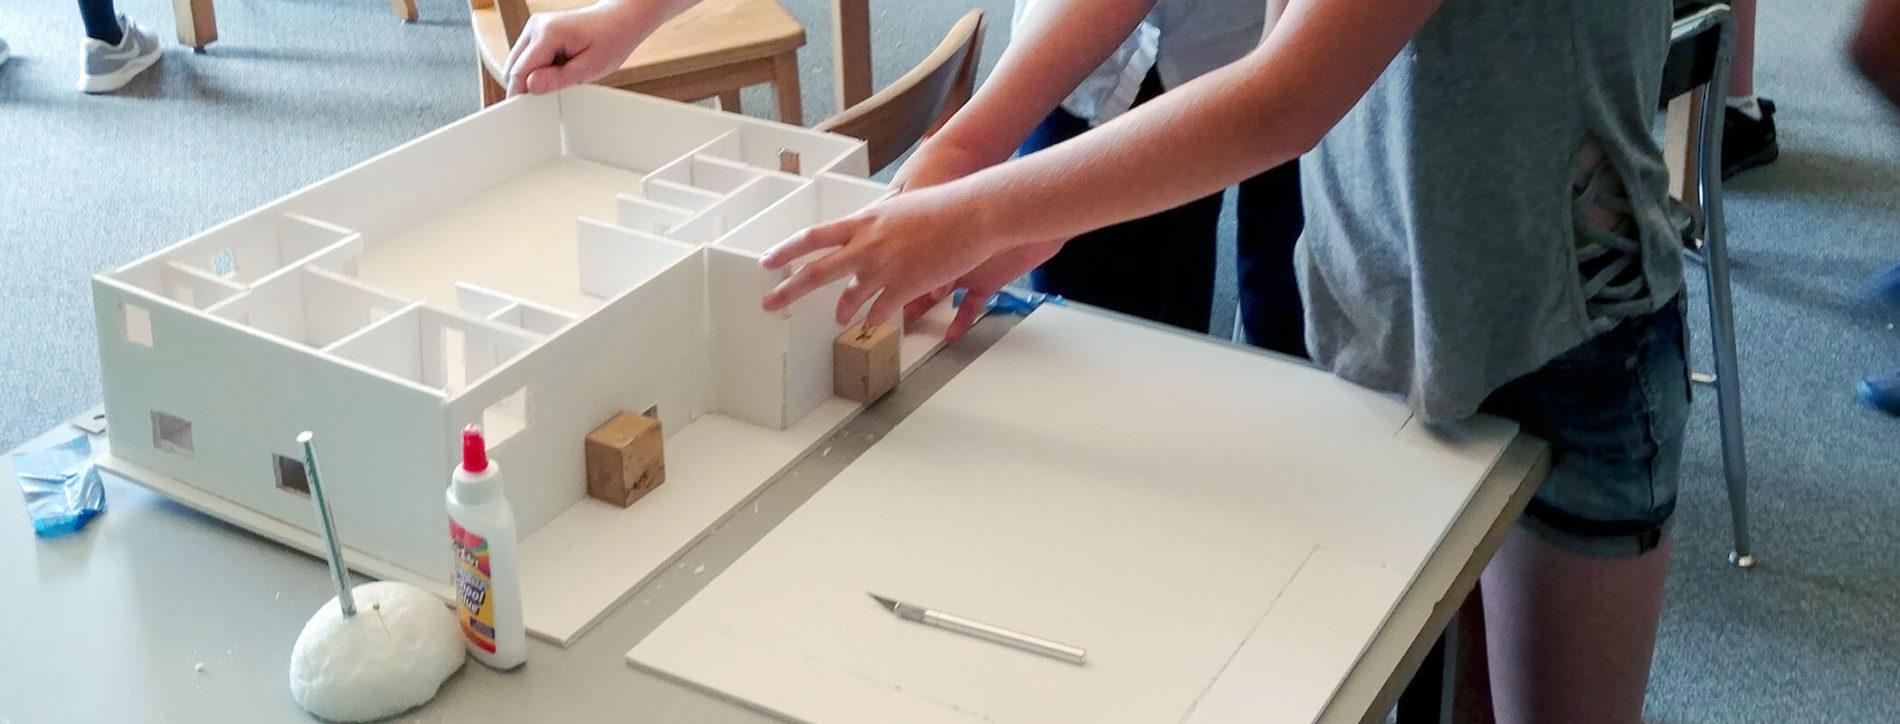 3D Architecture Camp